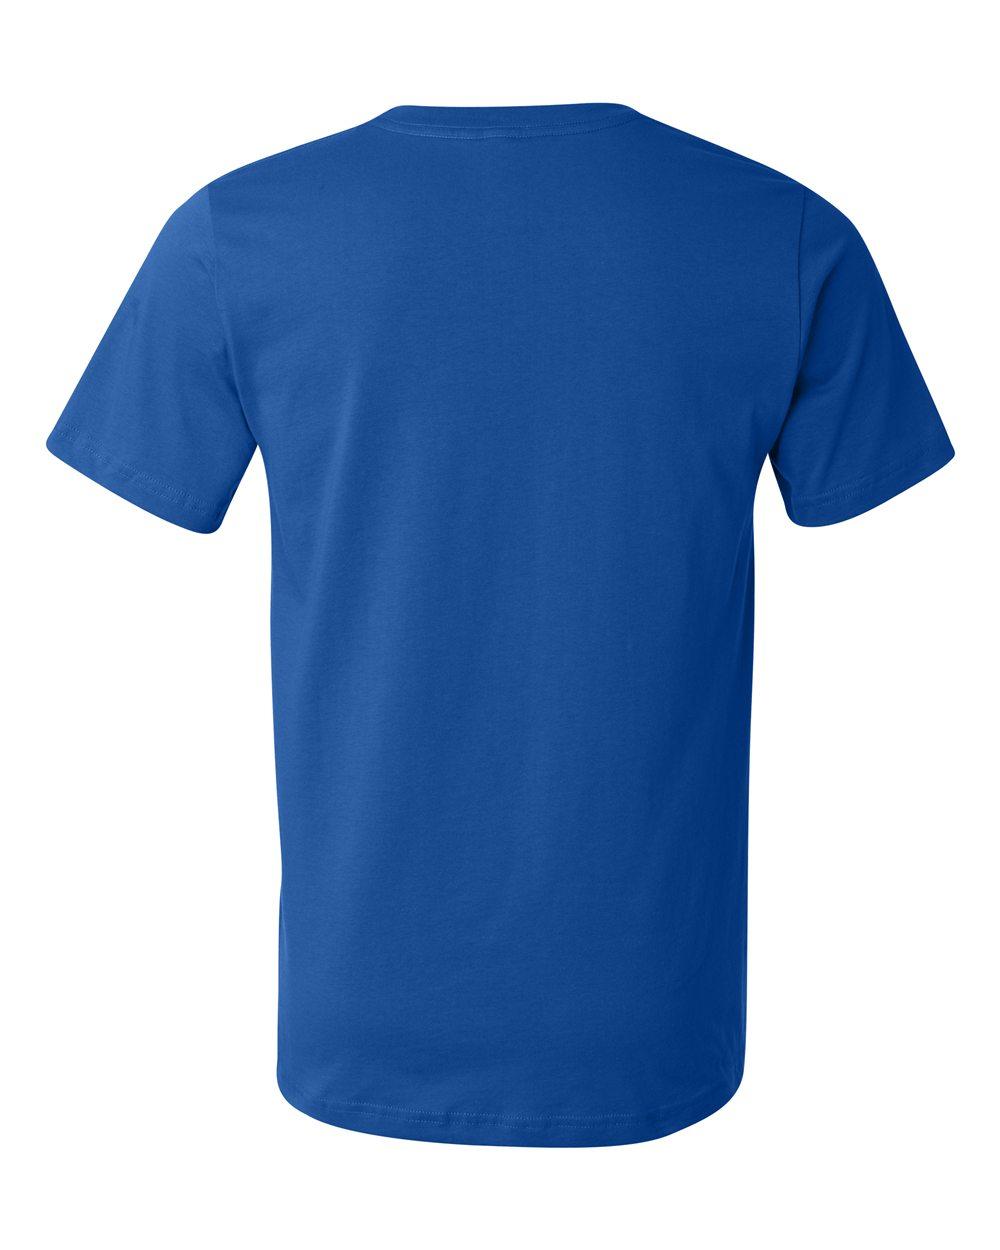 Bella-Canvas-Unisex-Made-in-USA-Jersey-Short-Sleeve-T-Shirt-3001U-XS-3XL thumbnail 28